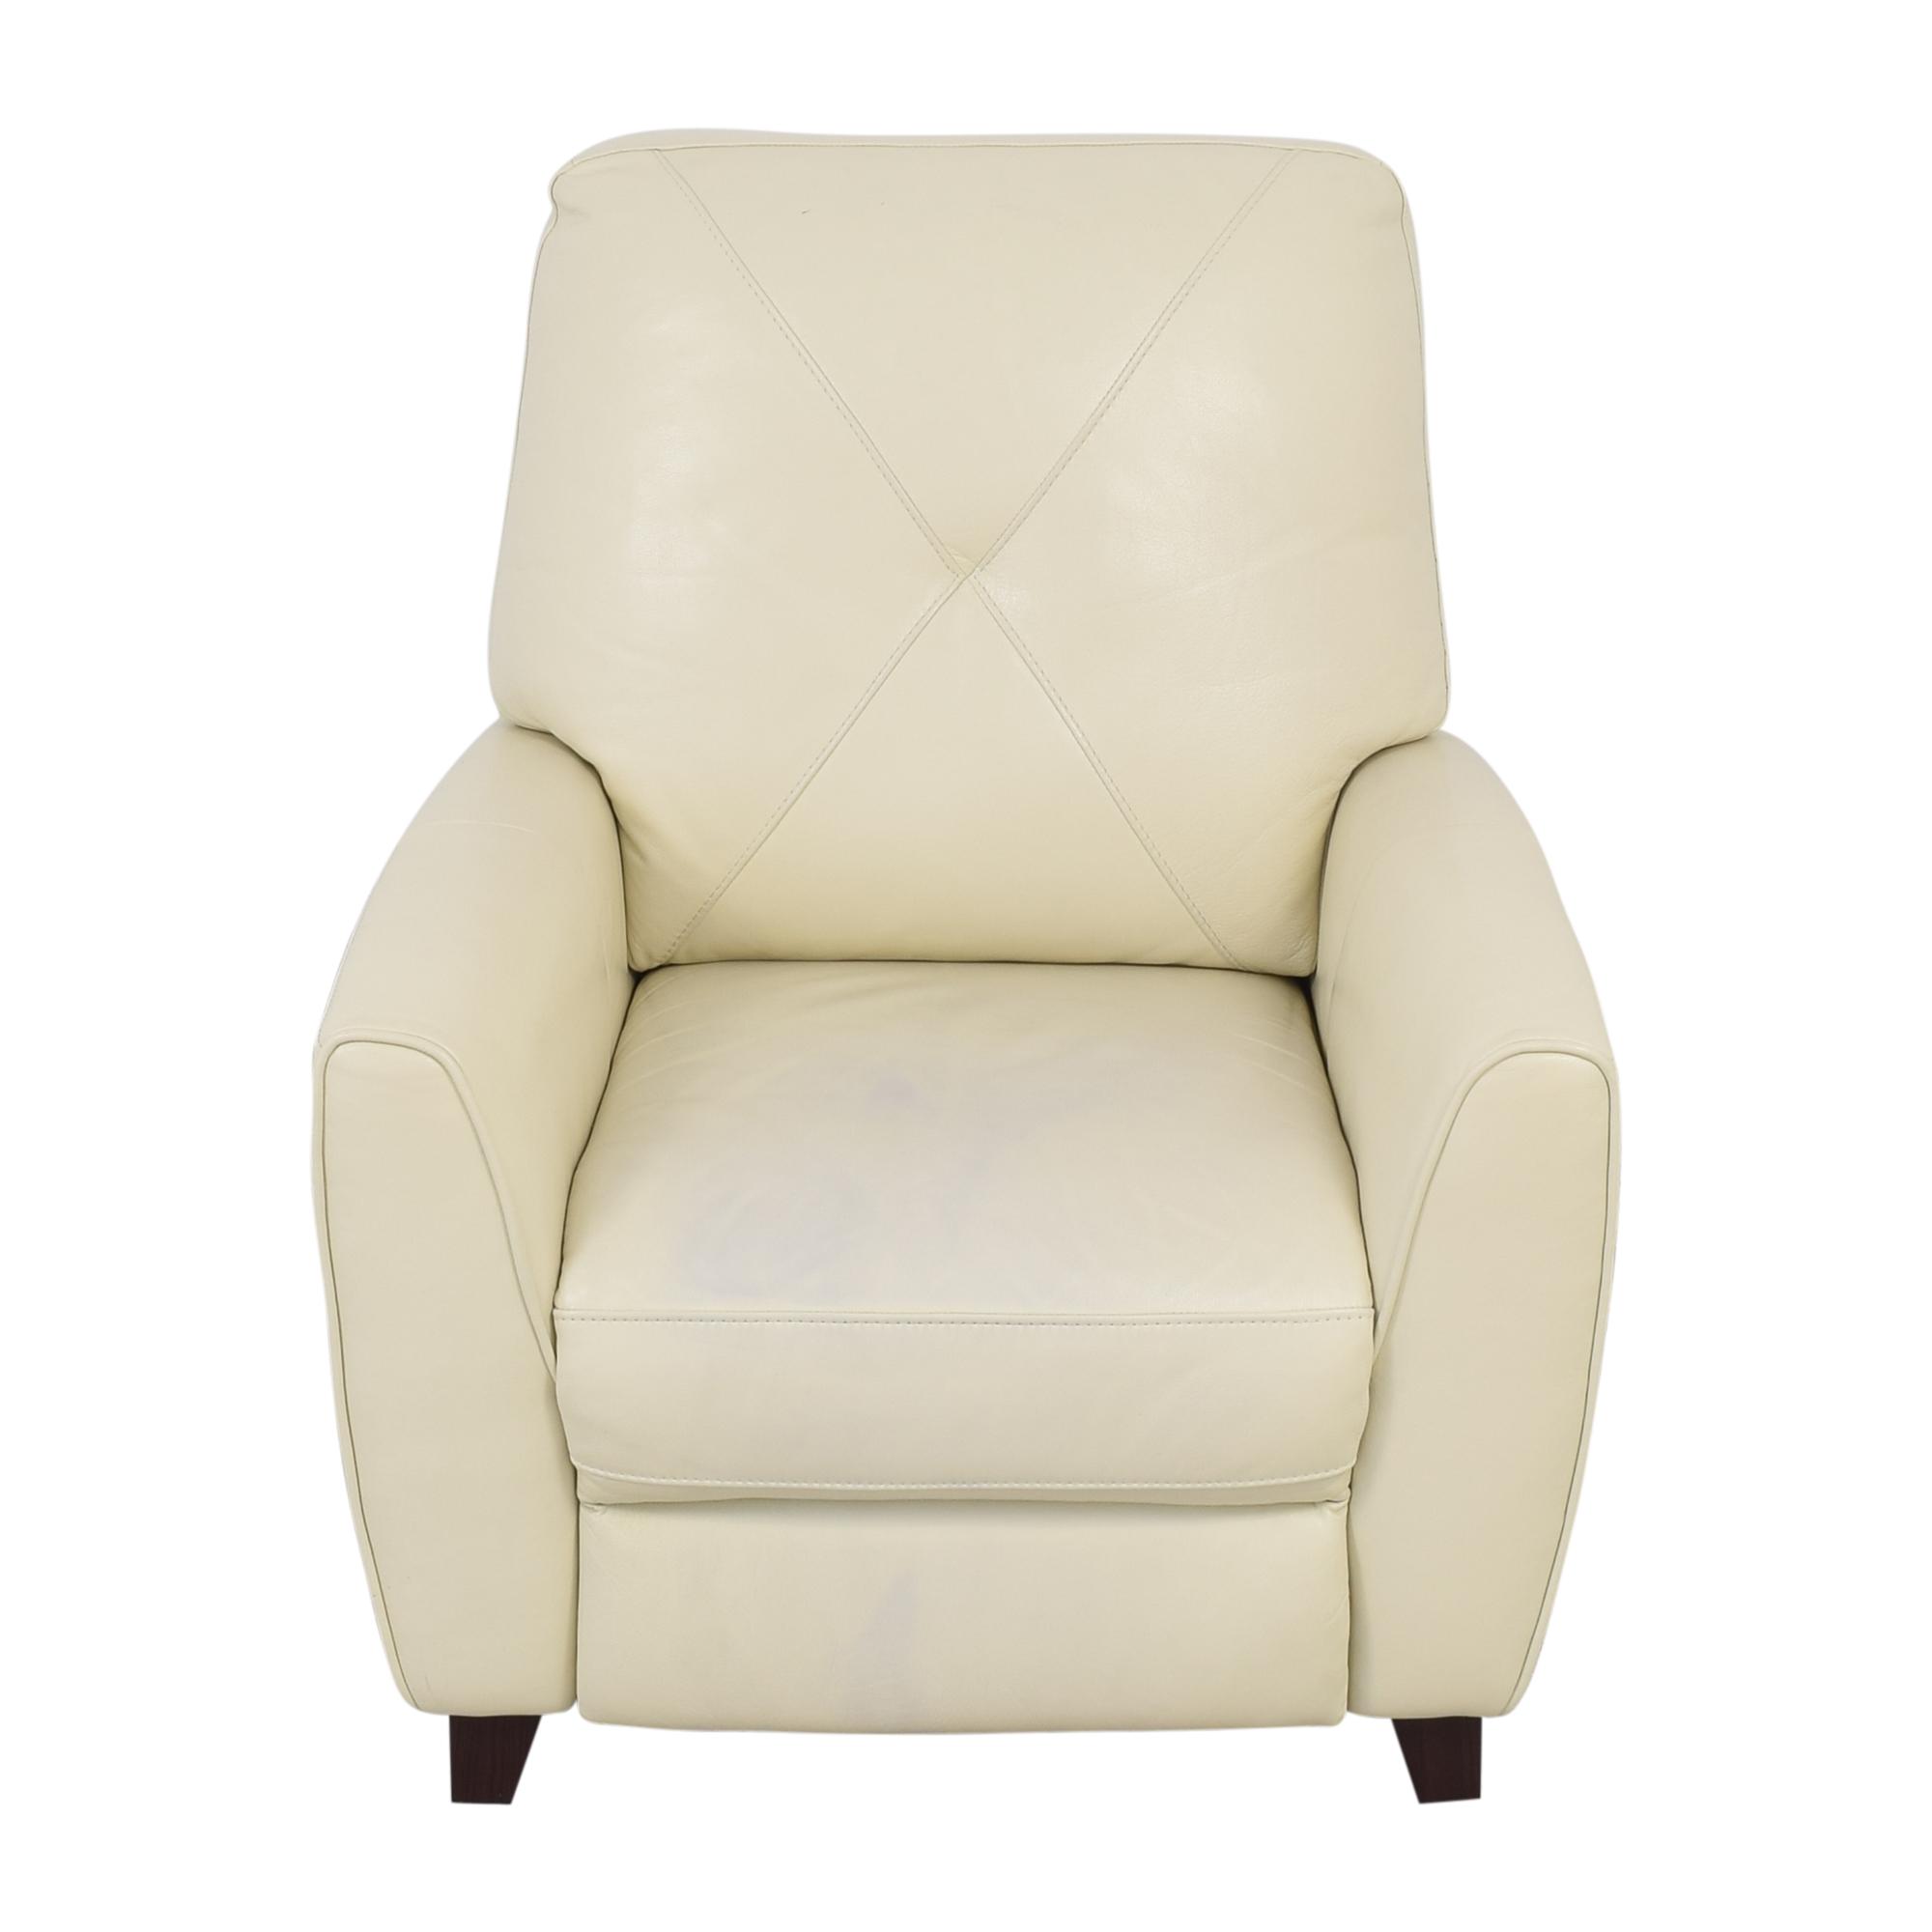 shop Macy's Myia Pushback Reclining Chair Macy's Chairs